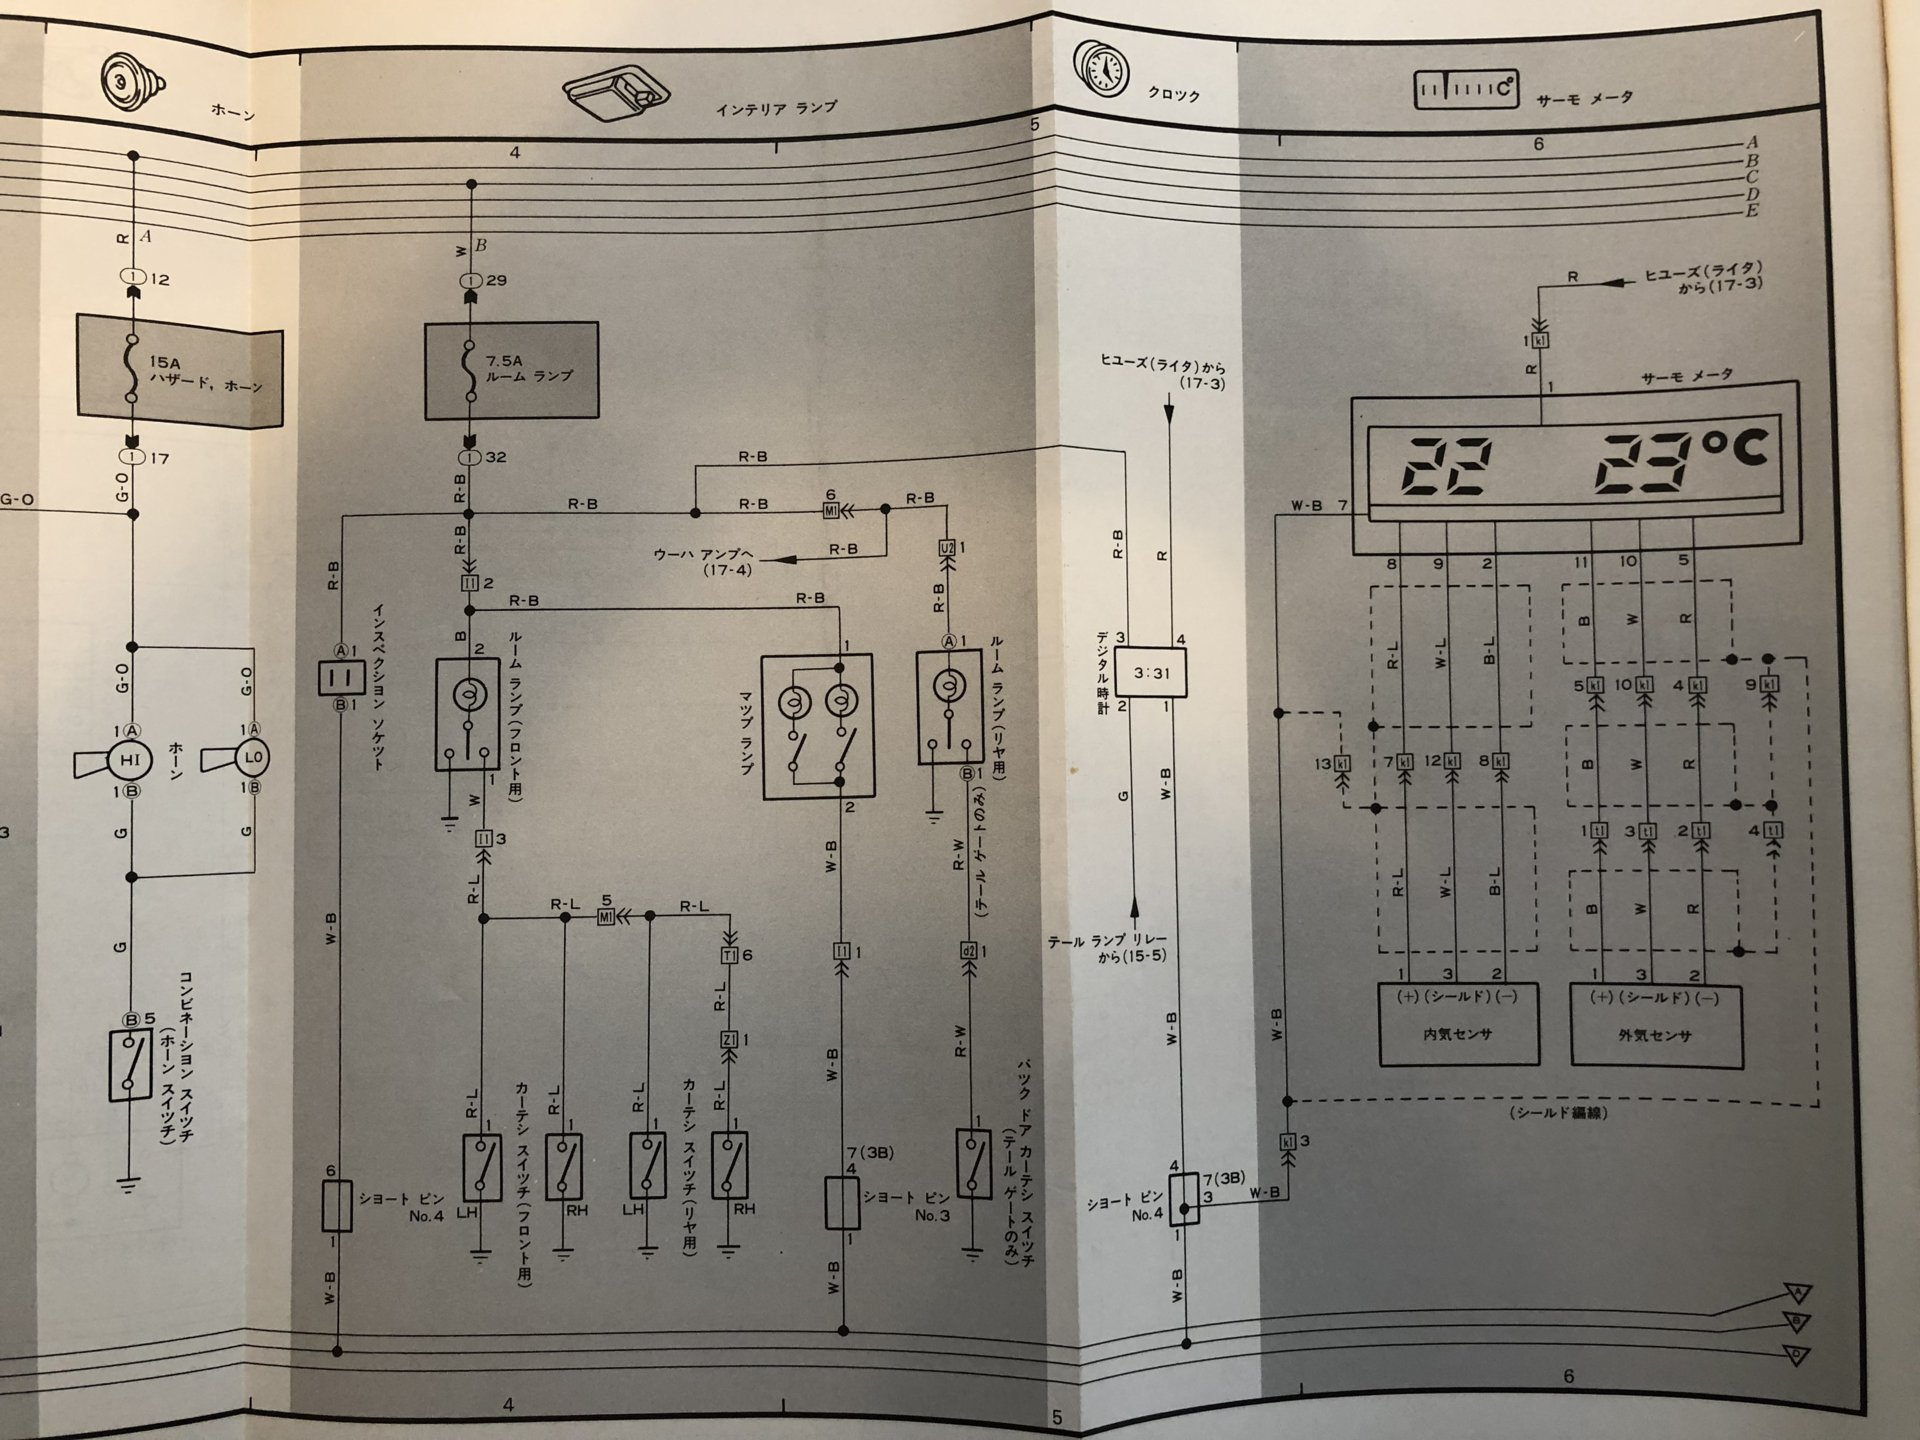 Diagram  Pin Designations Of The 7 Wiring Diagram Full